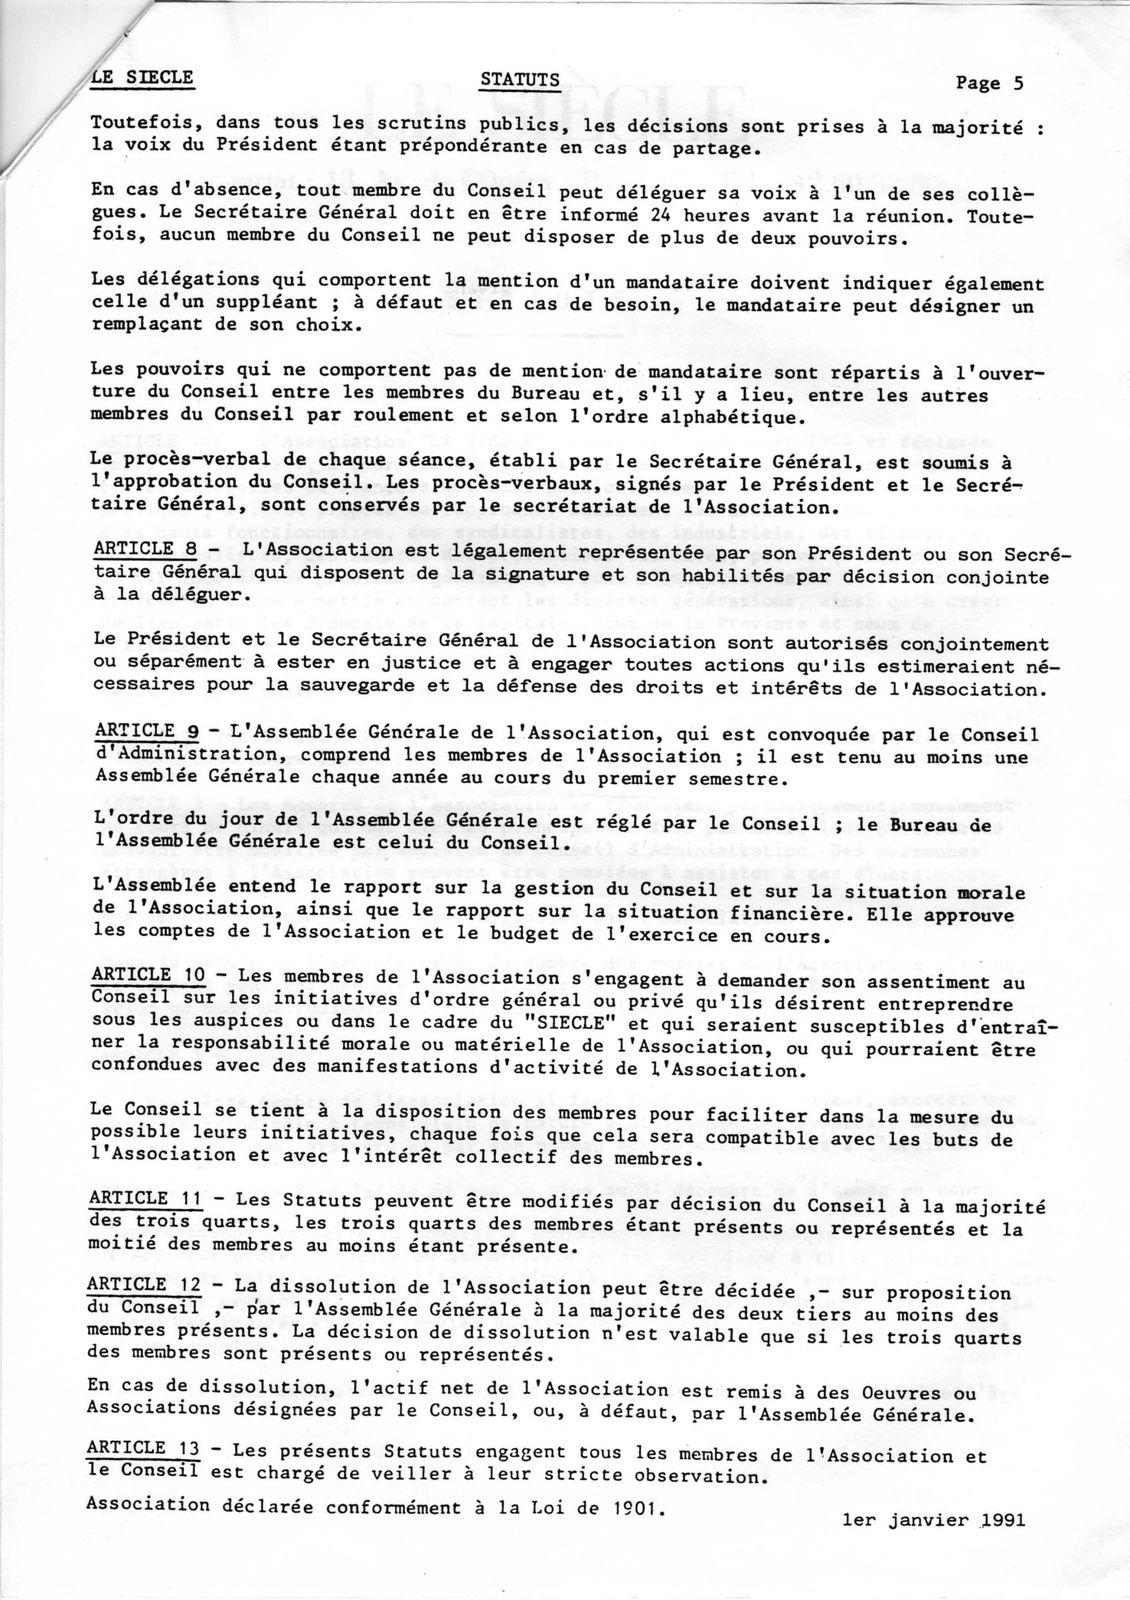 Le Siecle - 002 Page 5